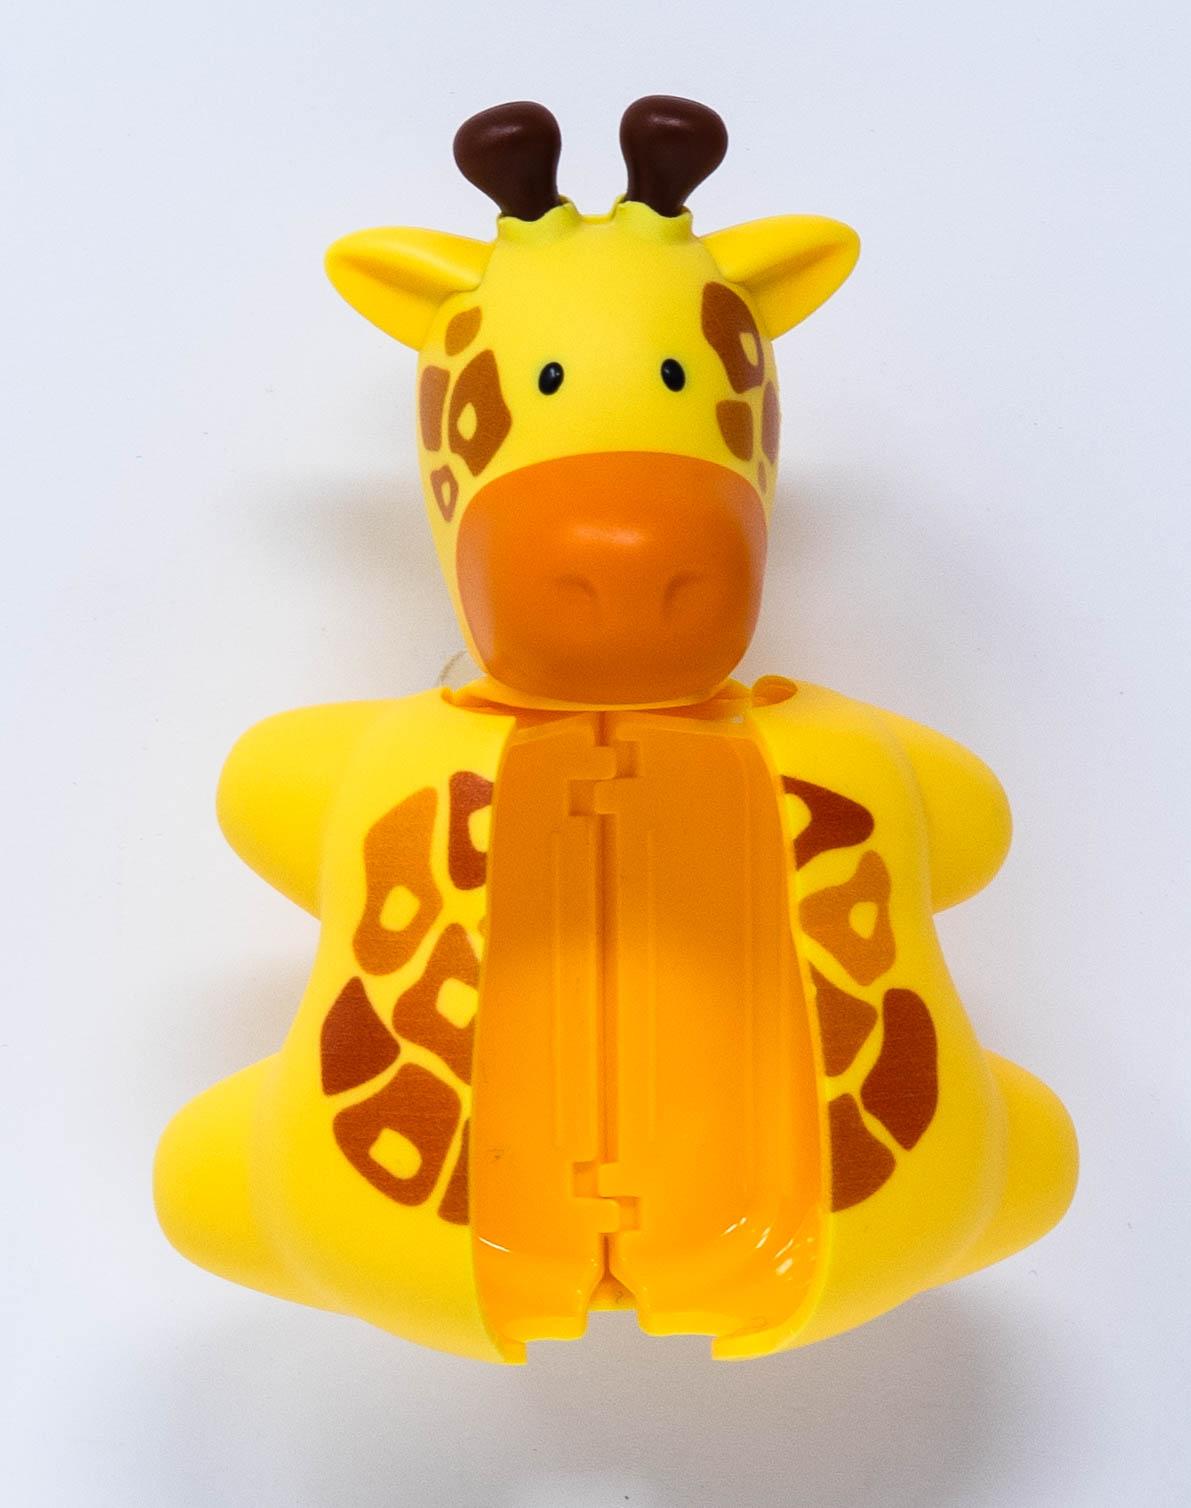 Miradent Porta Spazzolino Giraffa - 1 pz